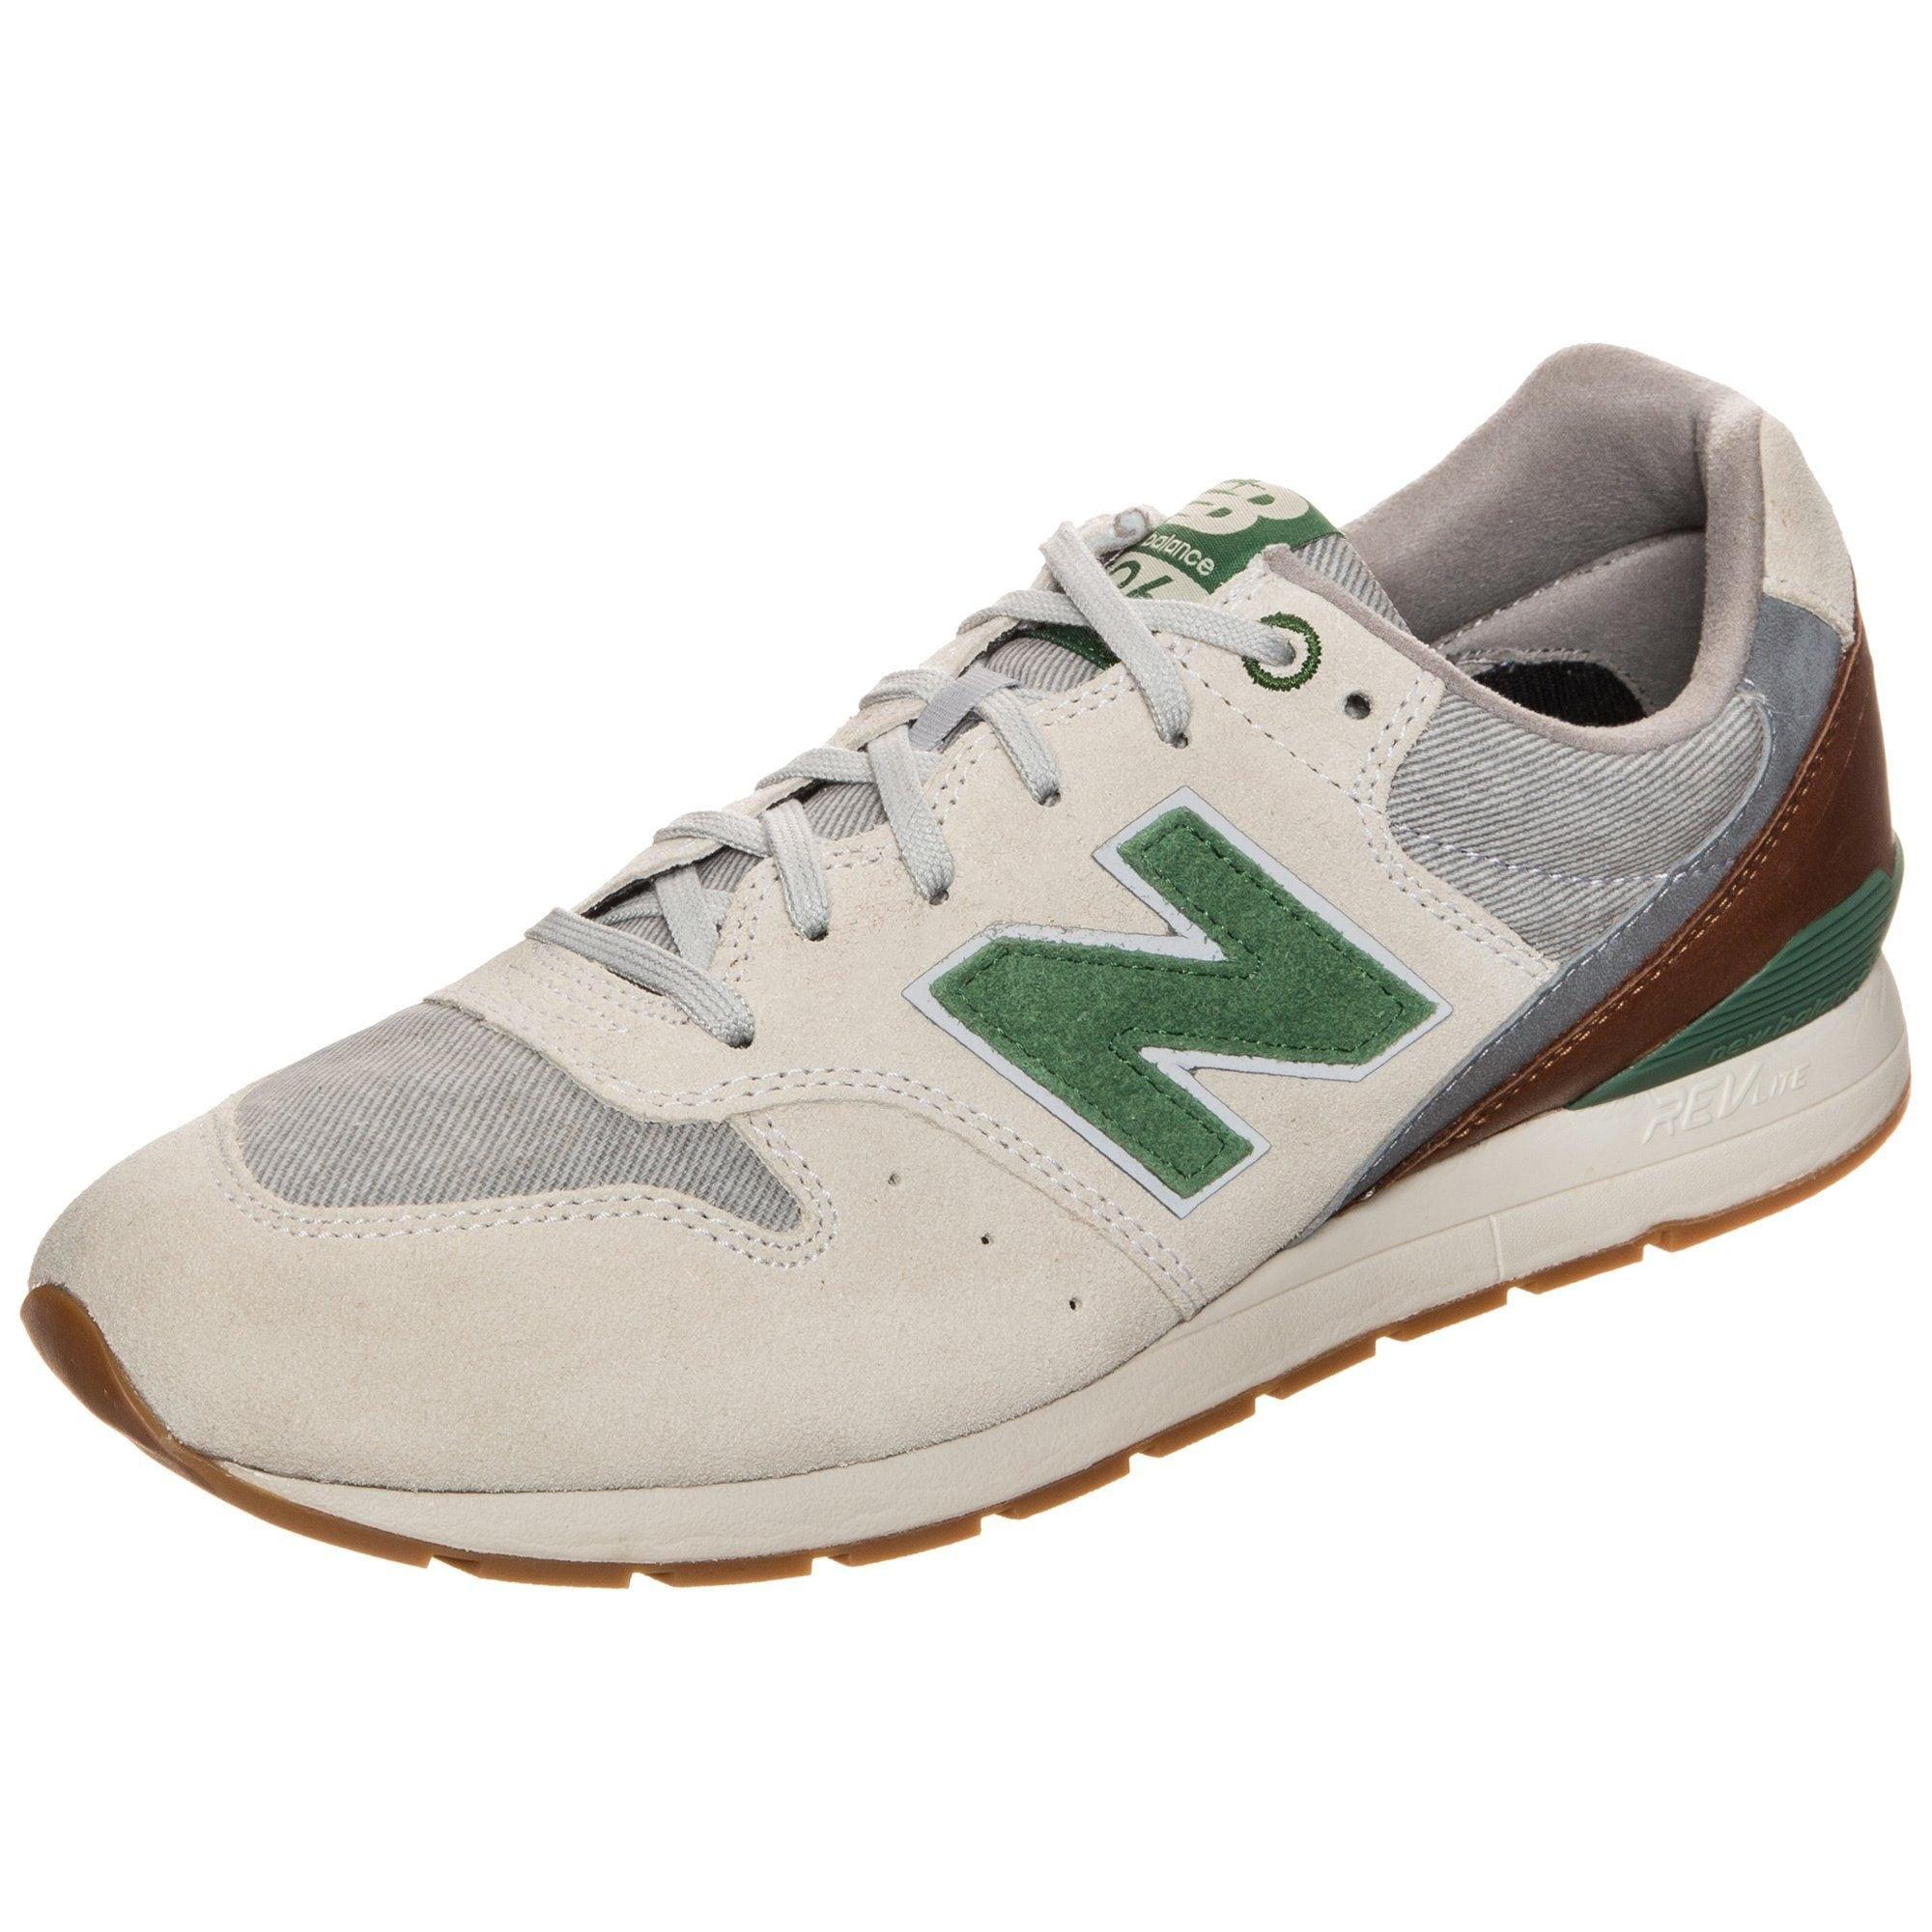 new balance mrl996 nh